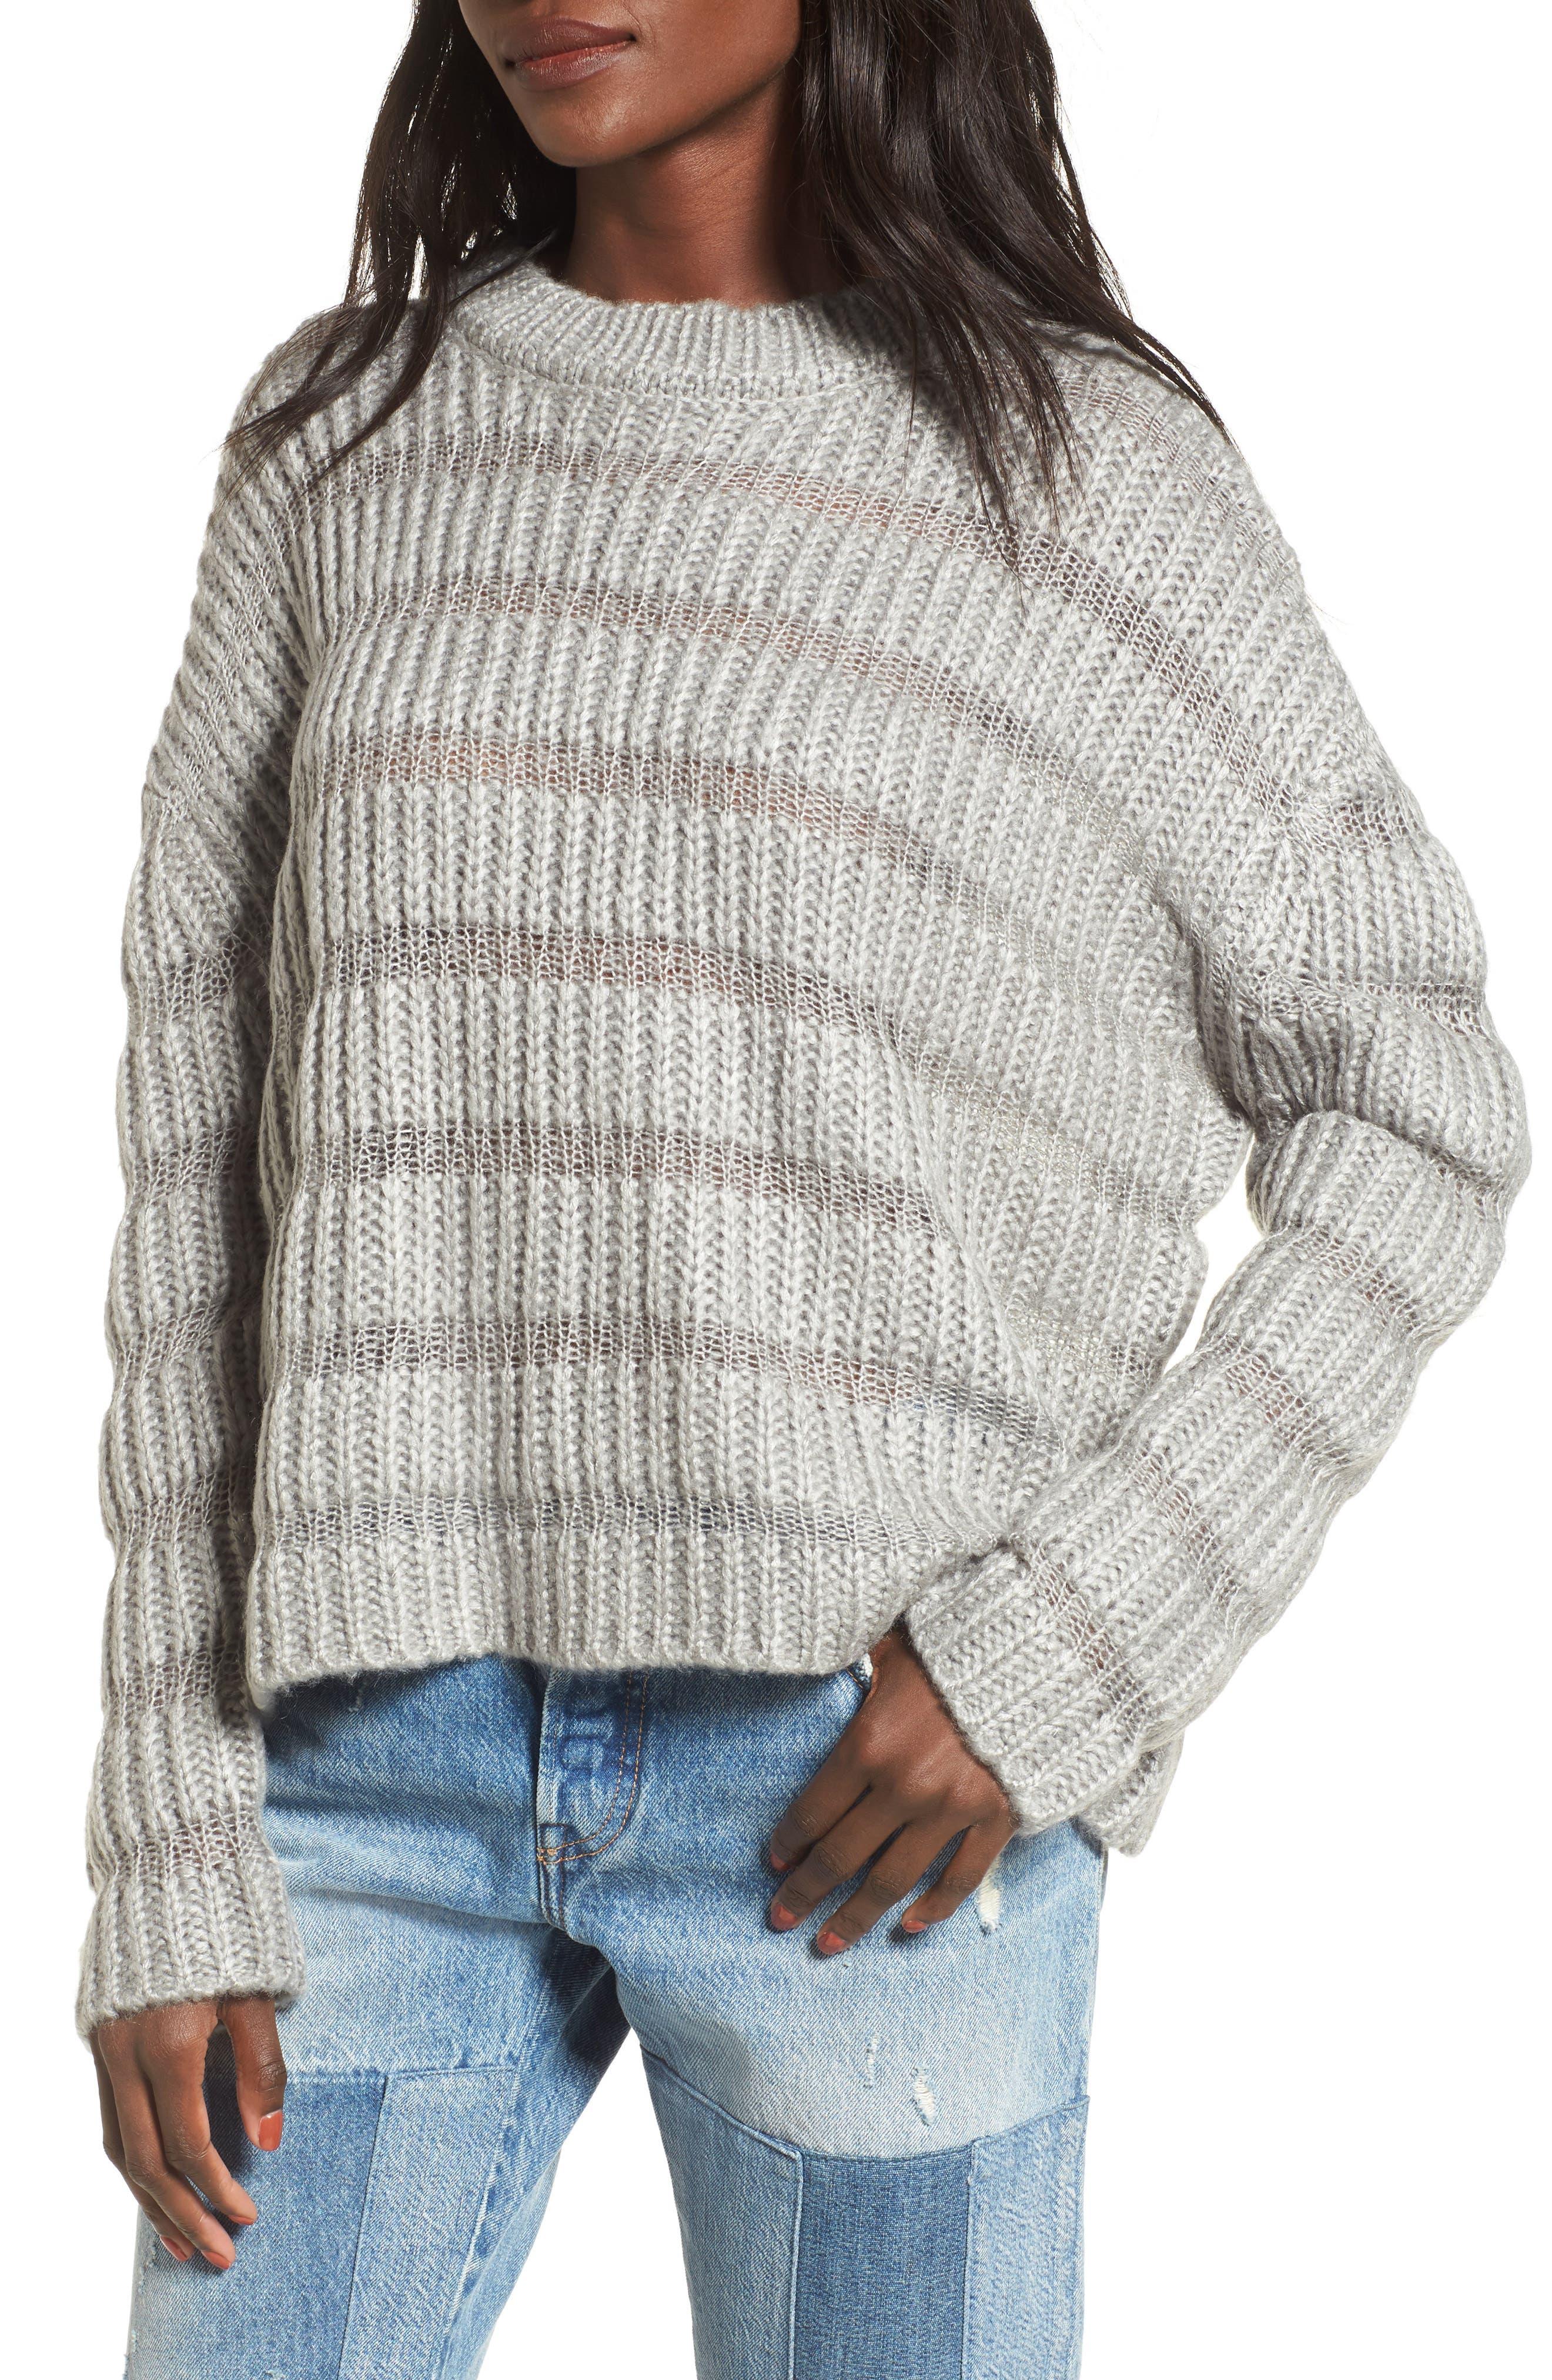 Main Image - Moon River Textured Stripe Crop Sweater